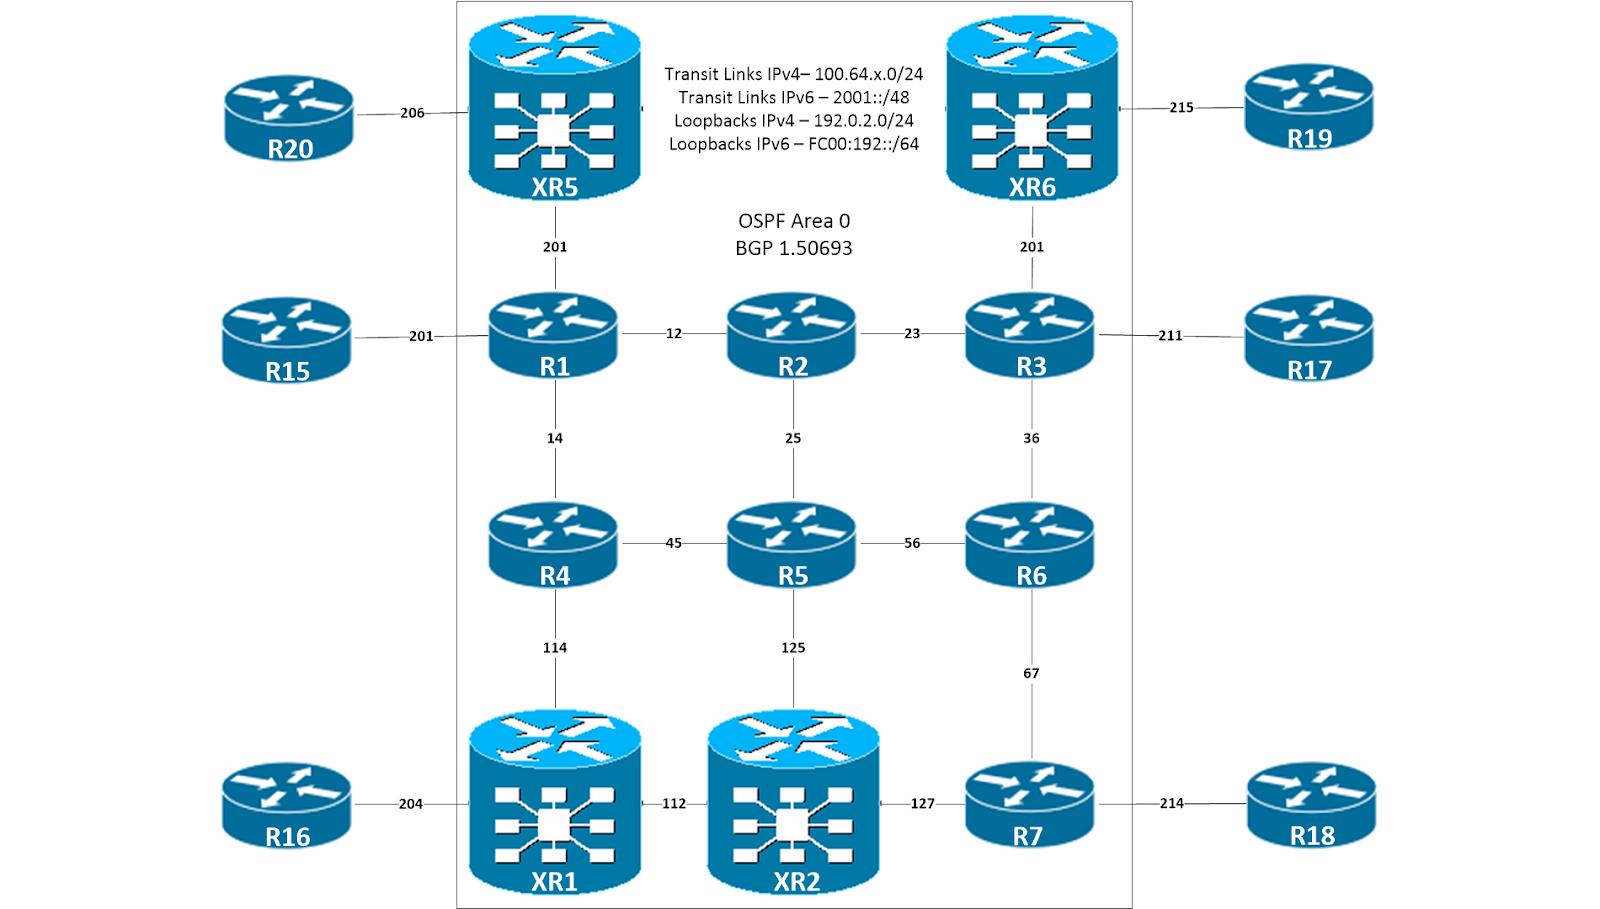 Rob Riker Networking: CCIE SPv4 MPLS Multicast VPN - Profile 14